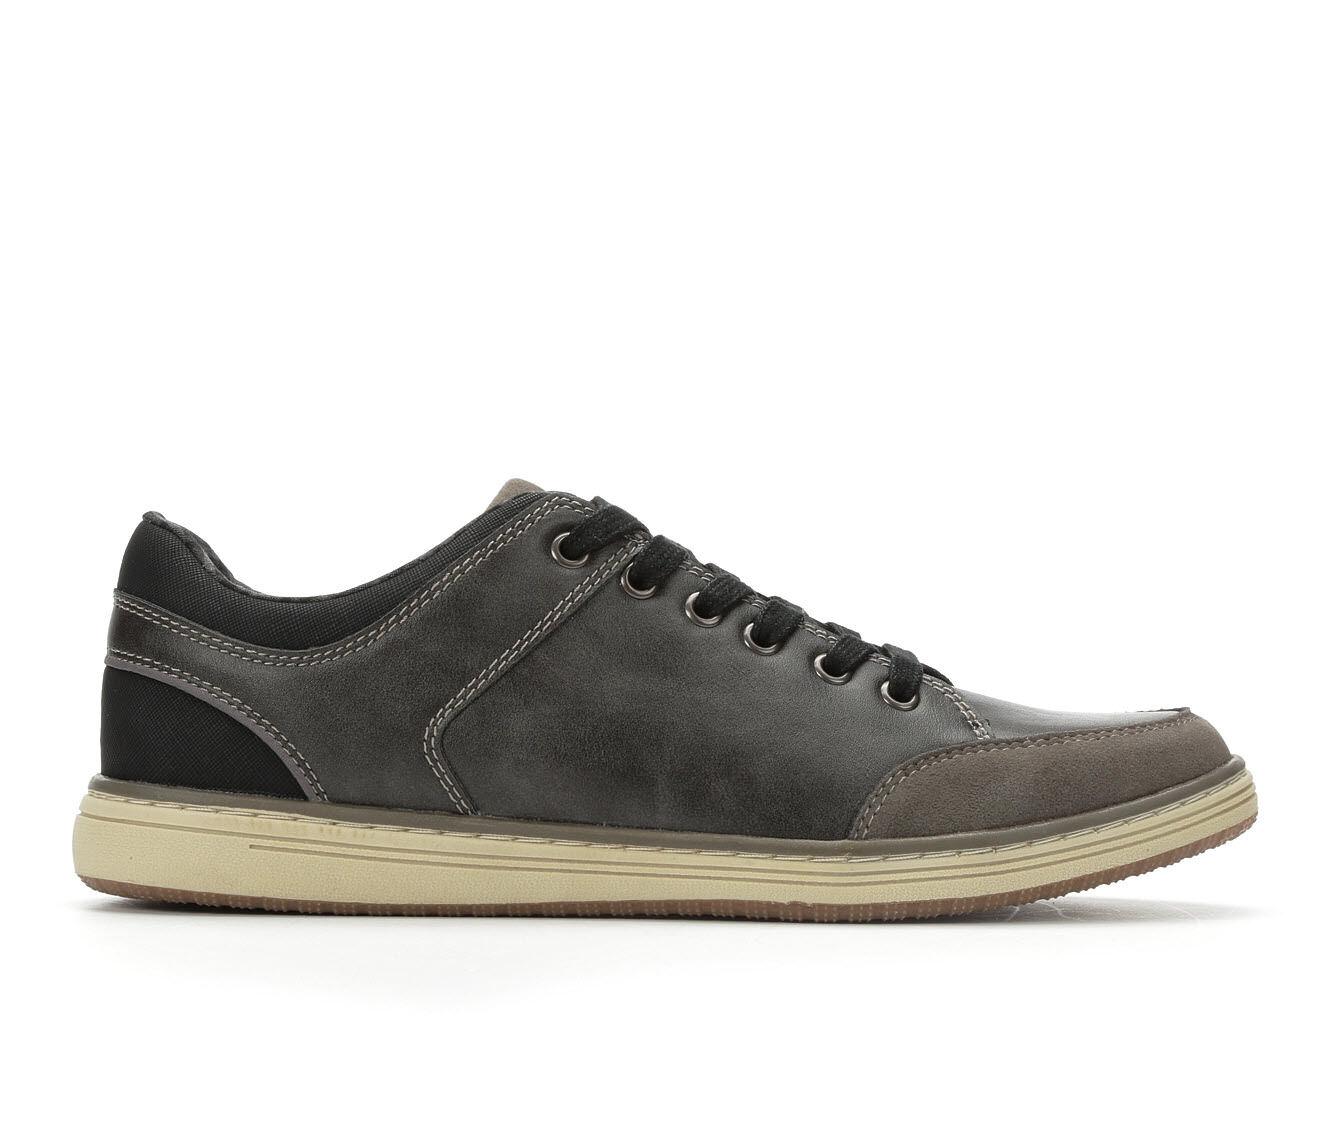 buy cheap amazing price Men's Gotcha Sheldon Sneakers outlet classic EX2wKxIbBr